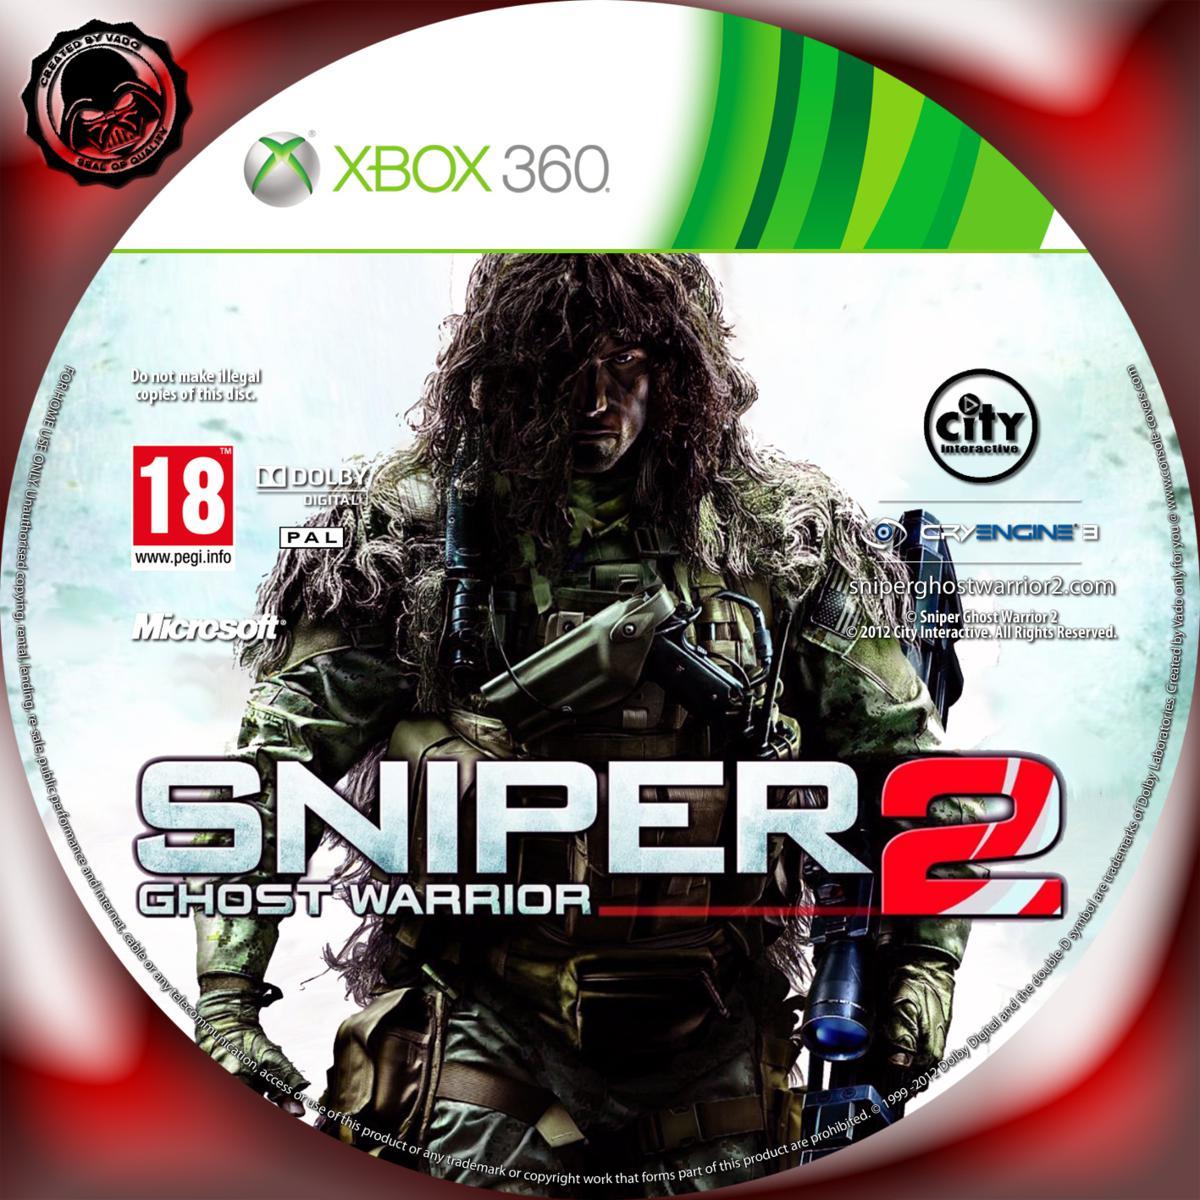 Label Sniper Ghost Warrior 2 Xbox 360